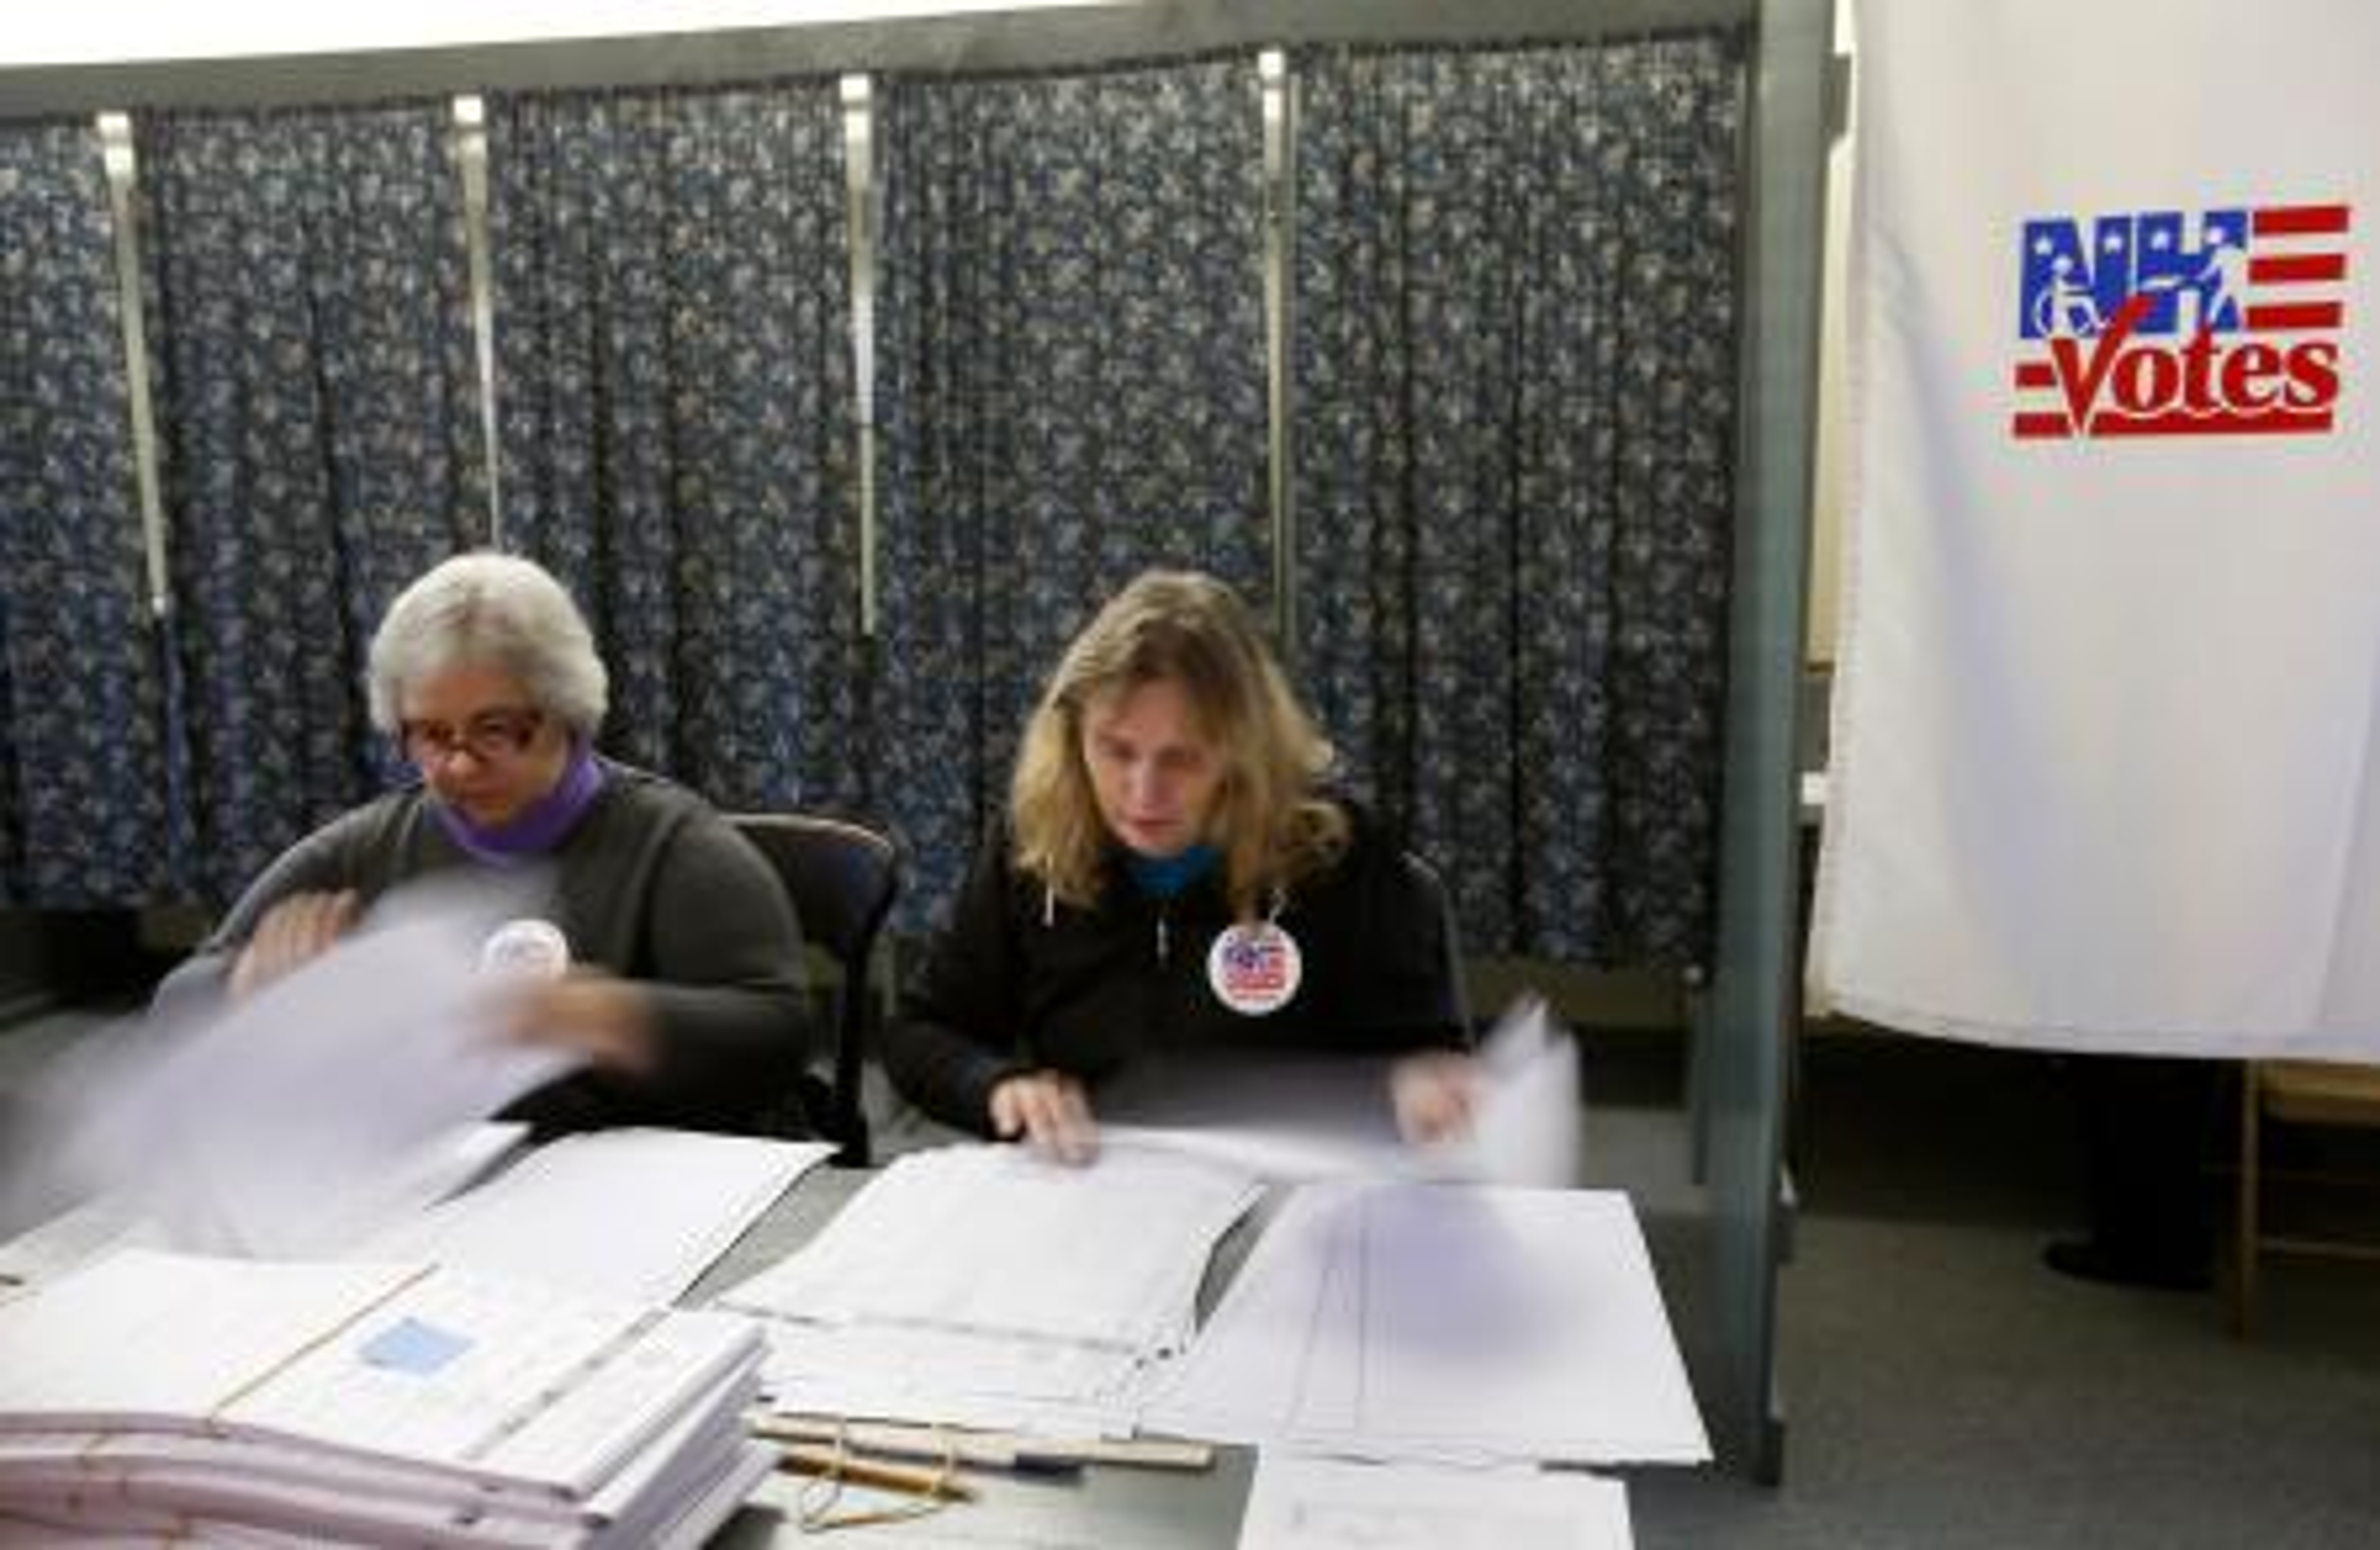 A woman sits reading ballots